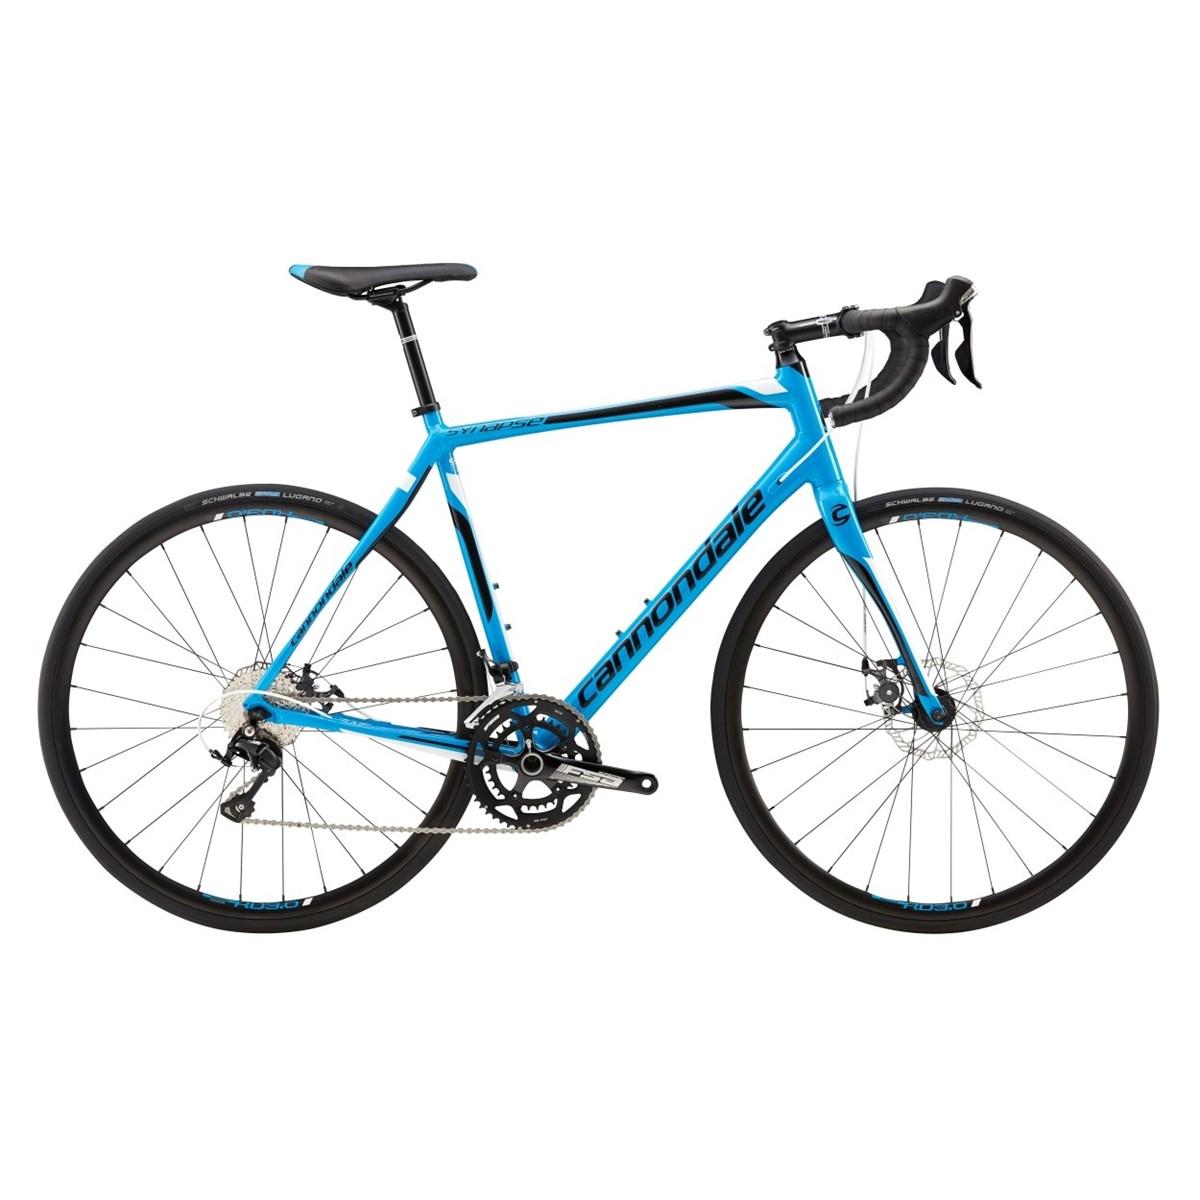 0b618dea1da 2016 Cannondale Synapse 105 54cm Aluminium Road Bike £850.00